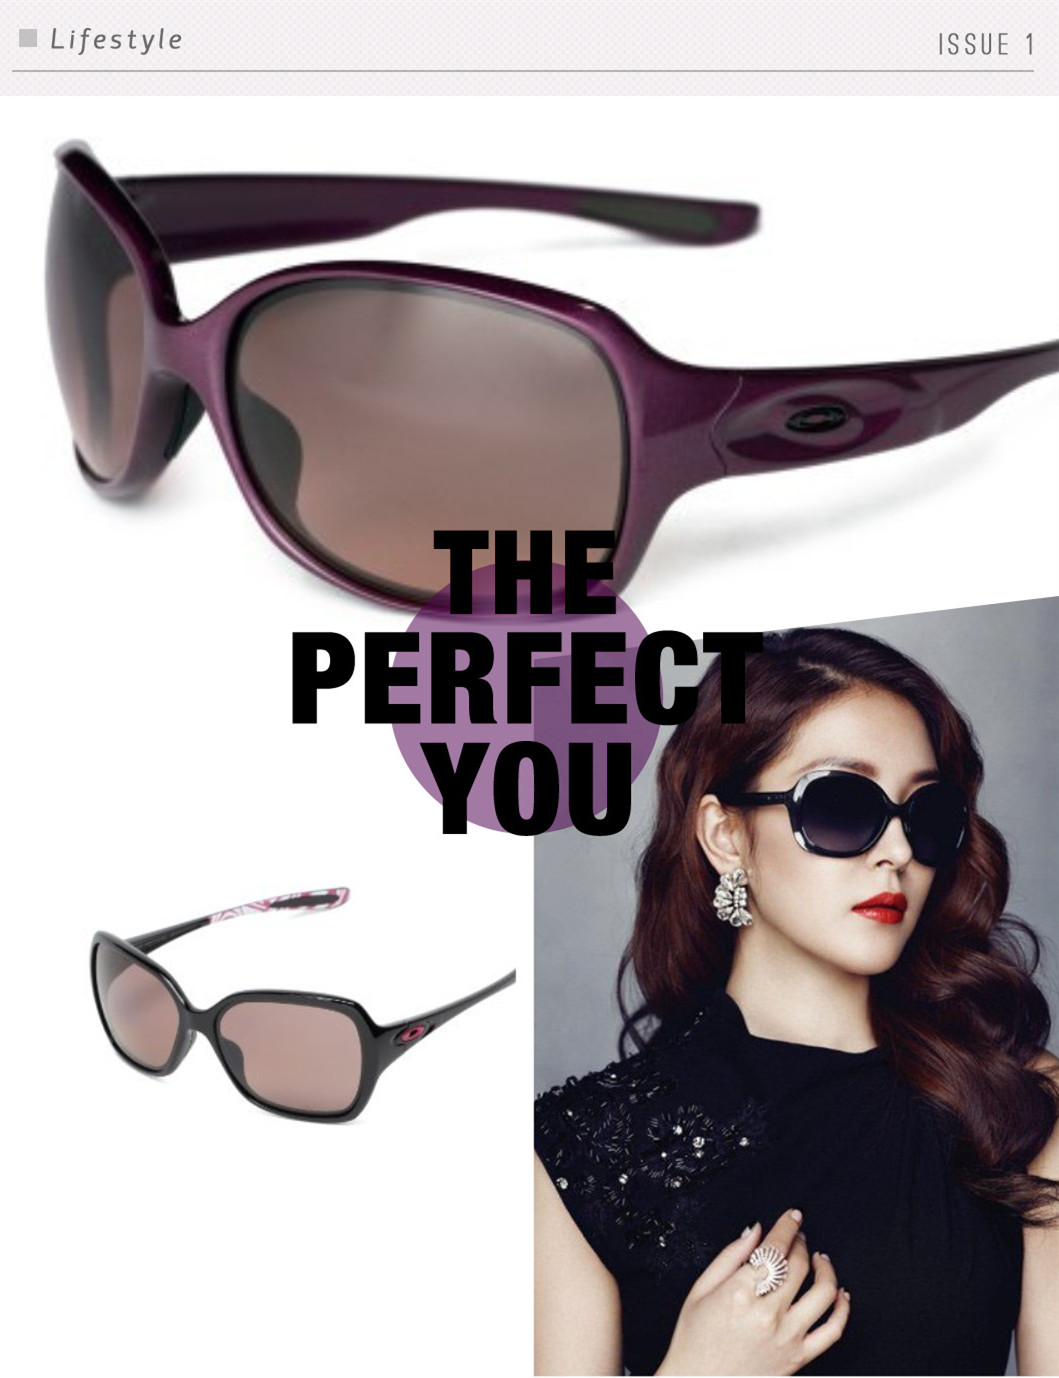 mqzwn Buy Fake Oakleys Cheap, Knockoff Oakley Sunglasses Sale scilmc